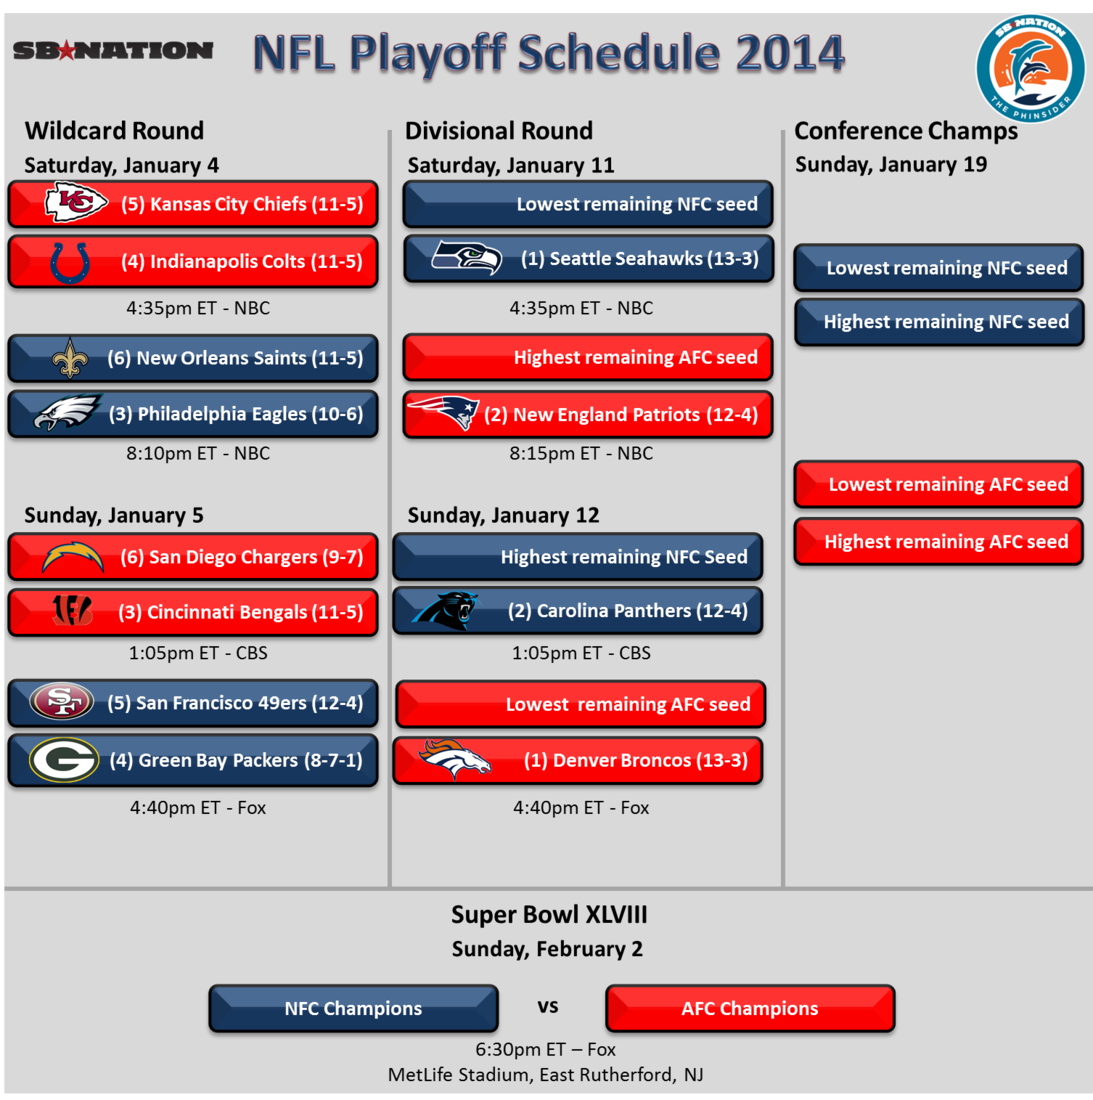 Nfl 2014 Game Schedule Nfl Playoffs Schedule 2014 Wildcard Divisional Games And Matchups Nfl Playoffs Playoff Schedule Nfl